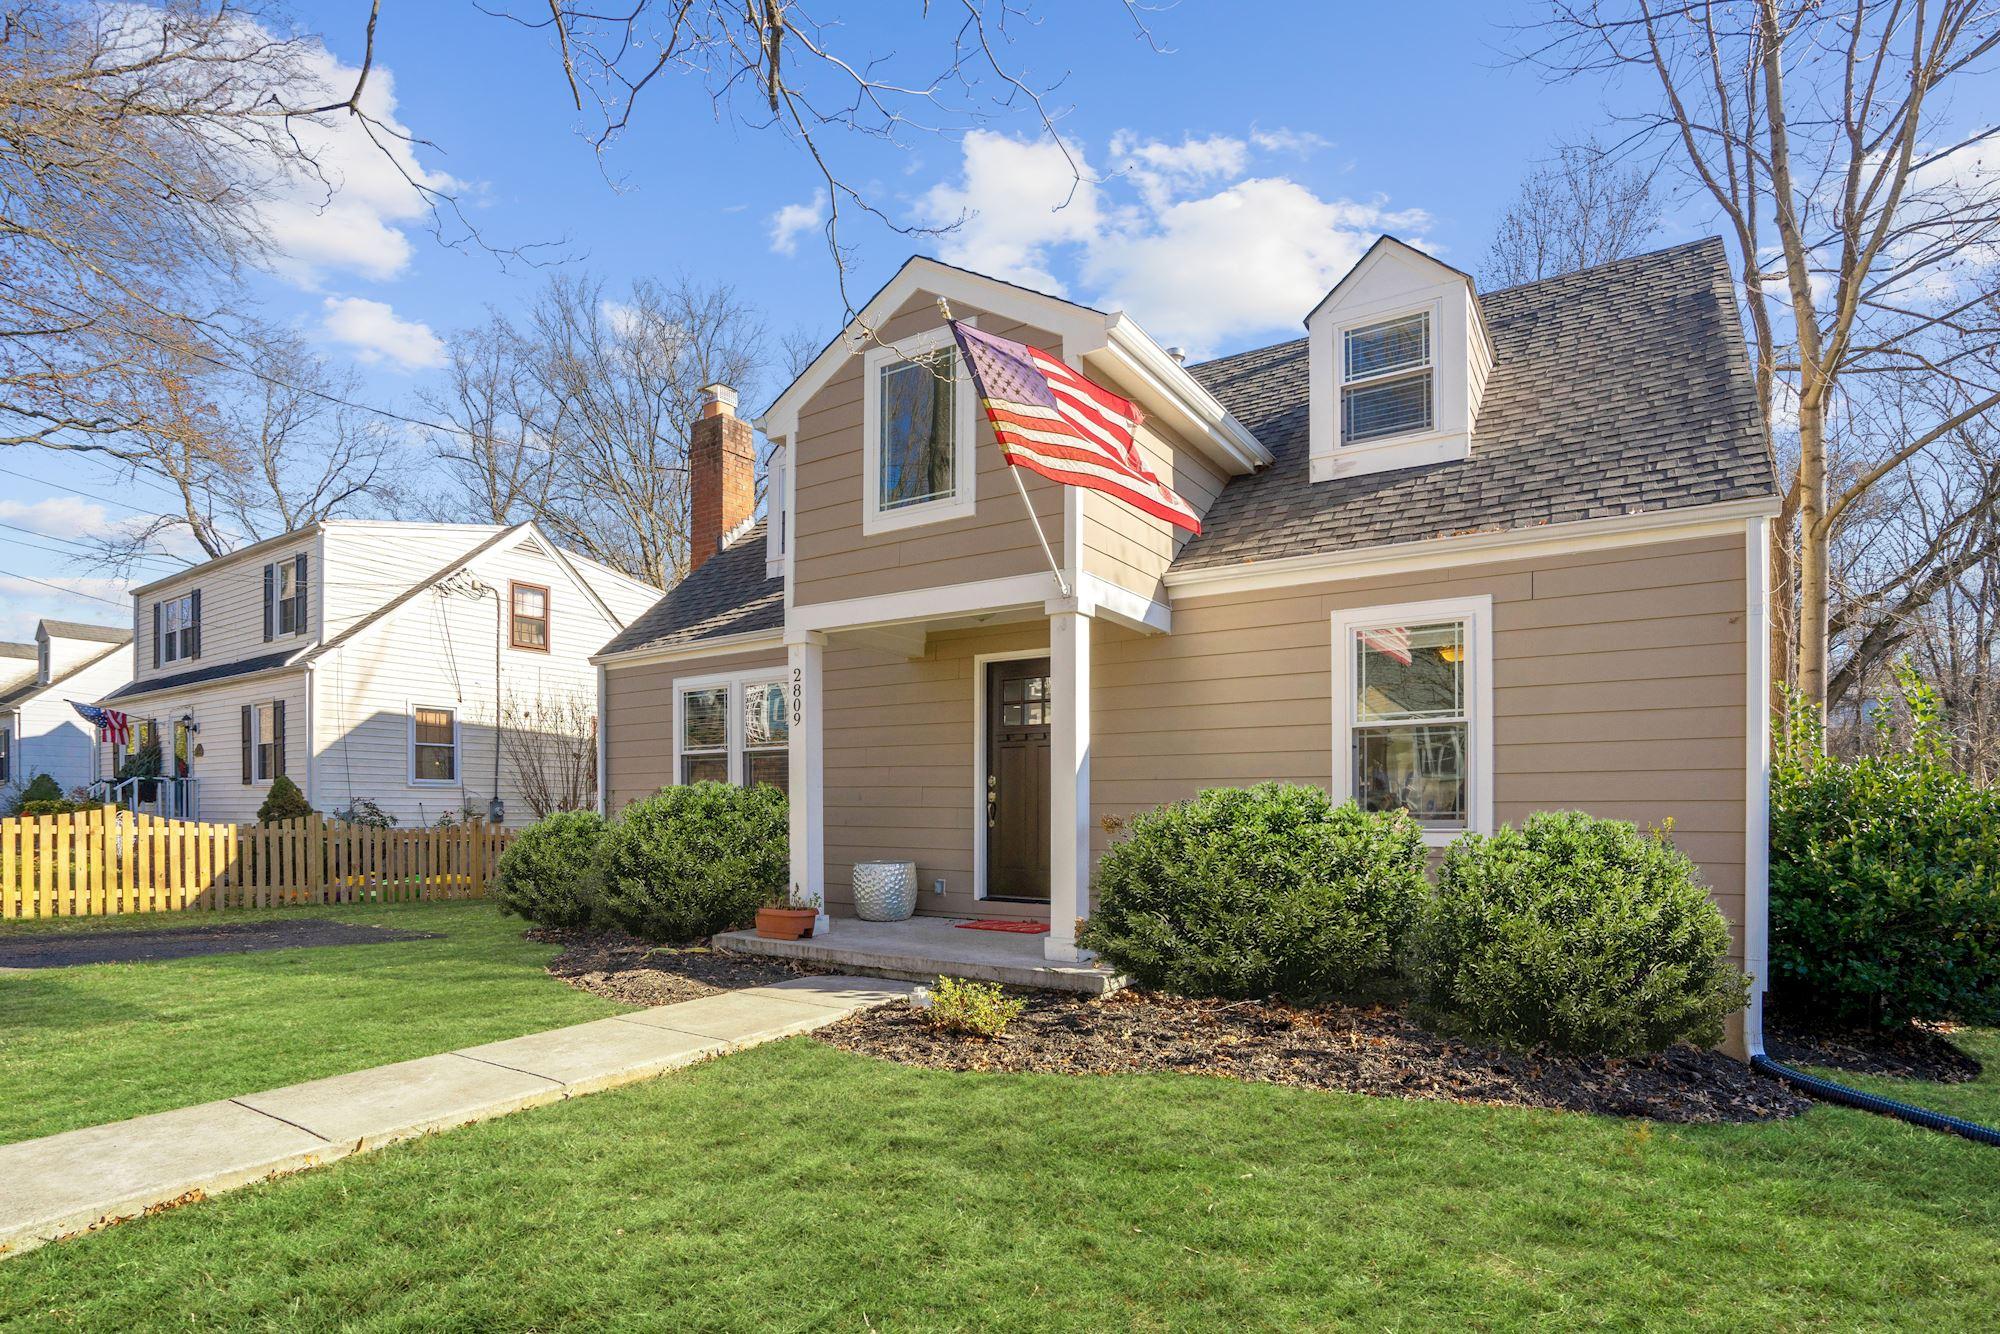 Renovated 5BR/3BA Single Family Home in Falls Church, VA